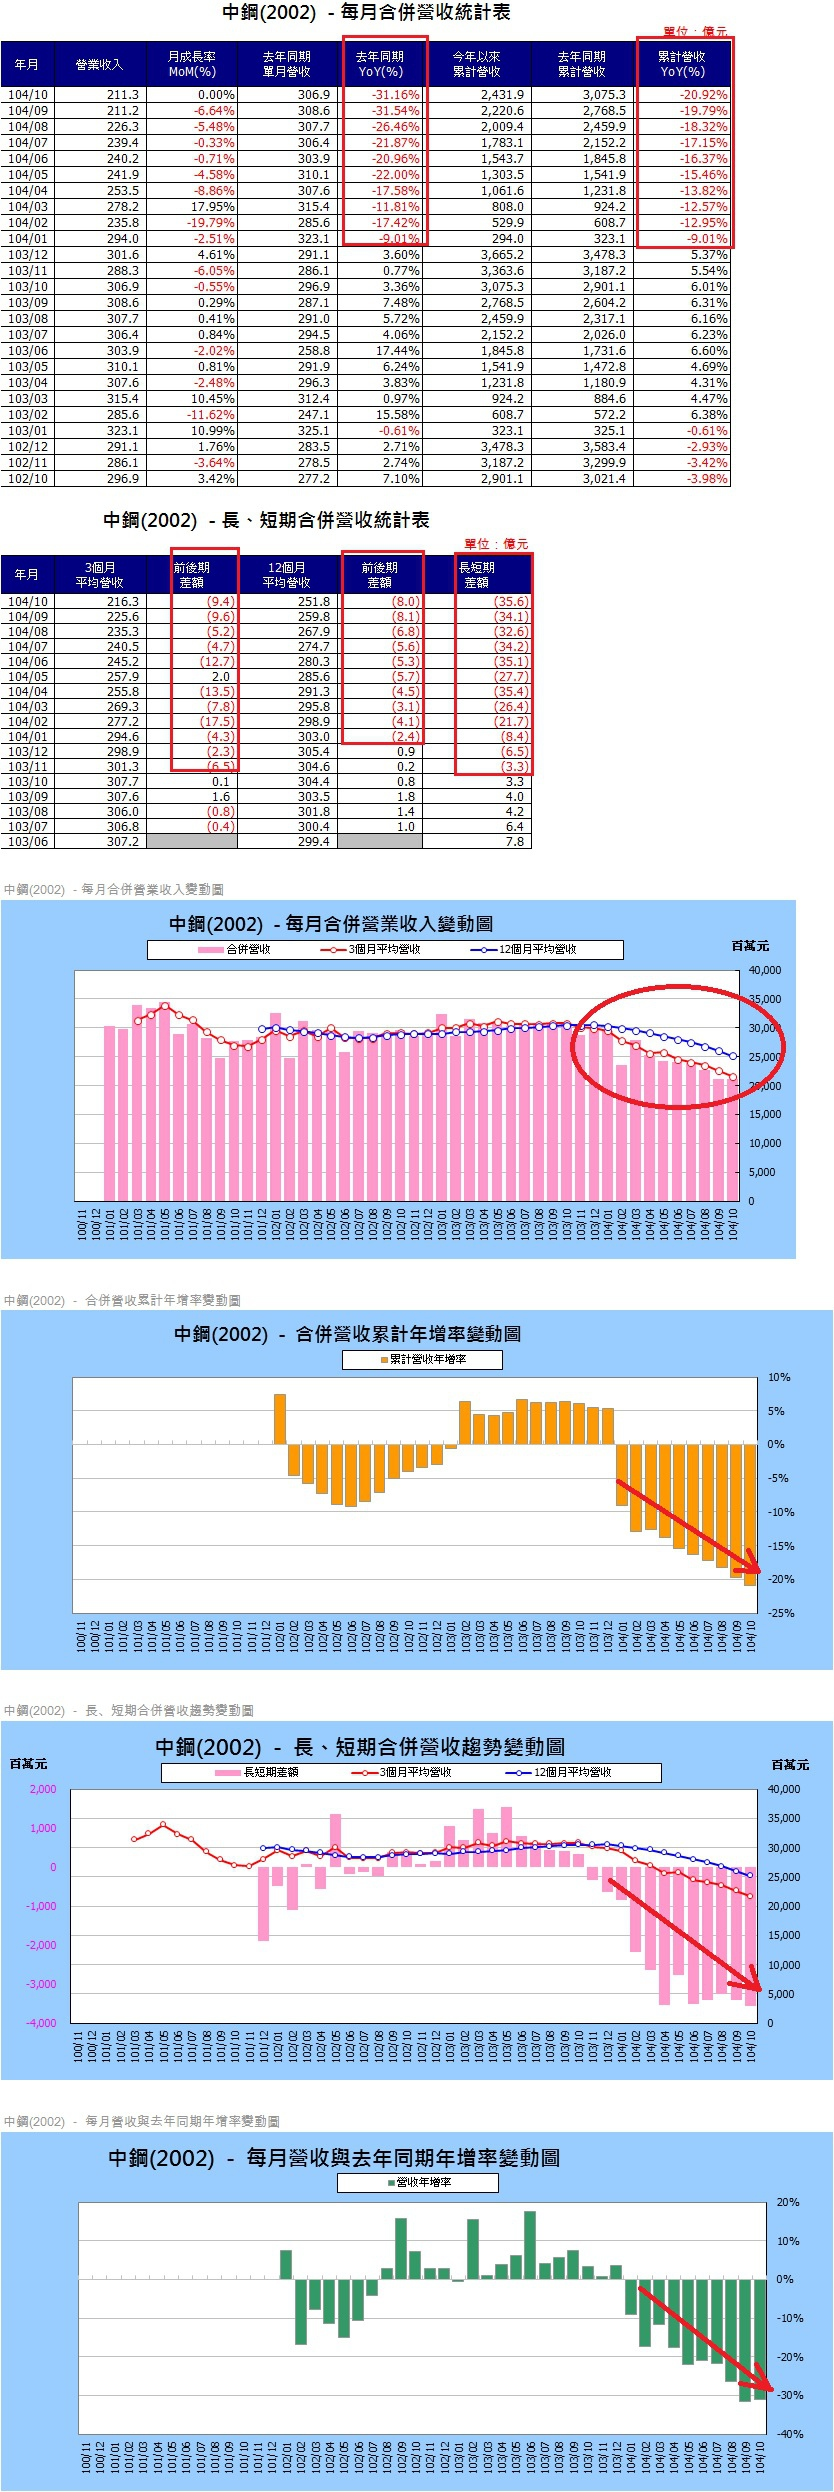 中鋼(2002)各月營收圖表